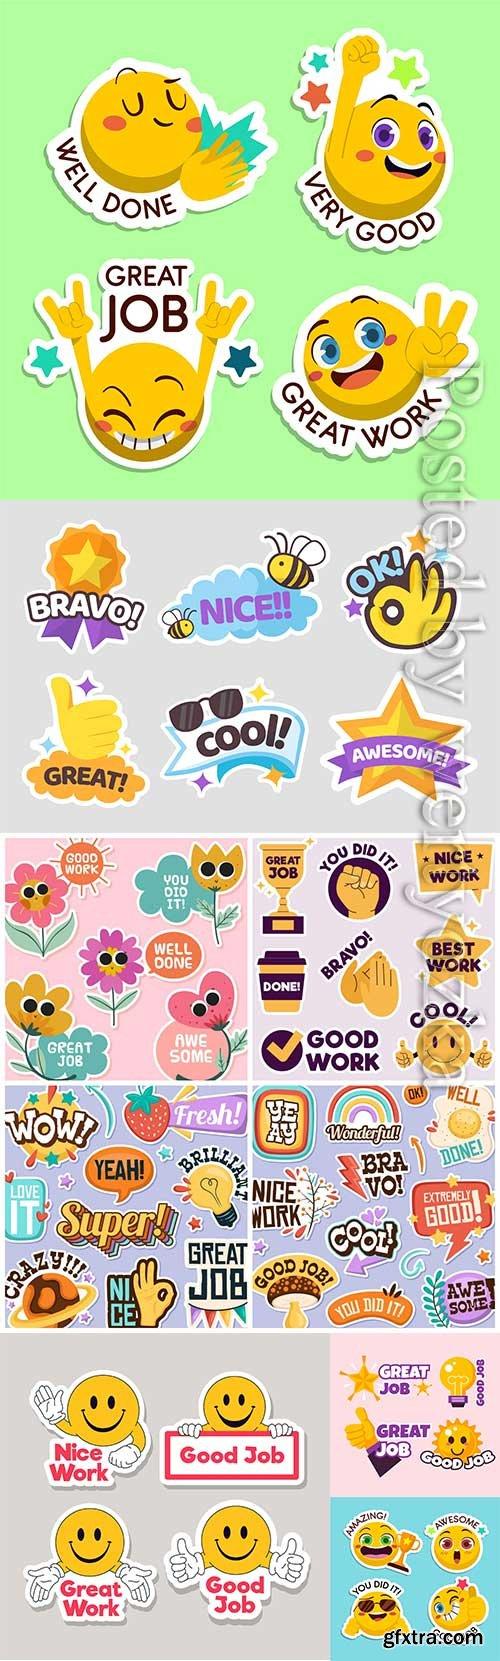 Cartoon good job and great job sticker collection